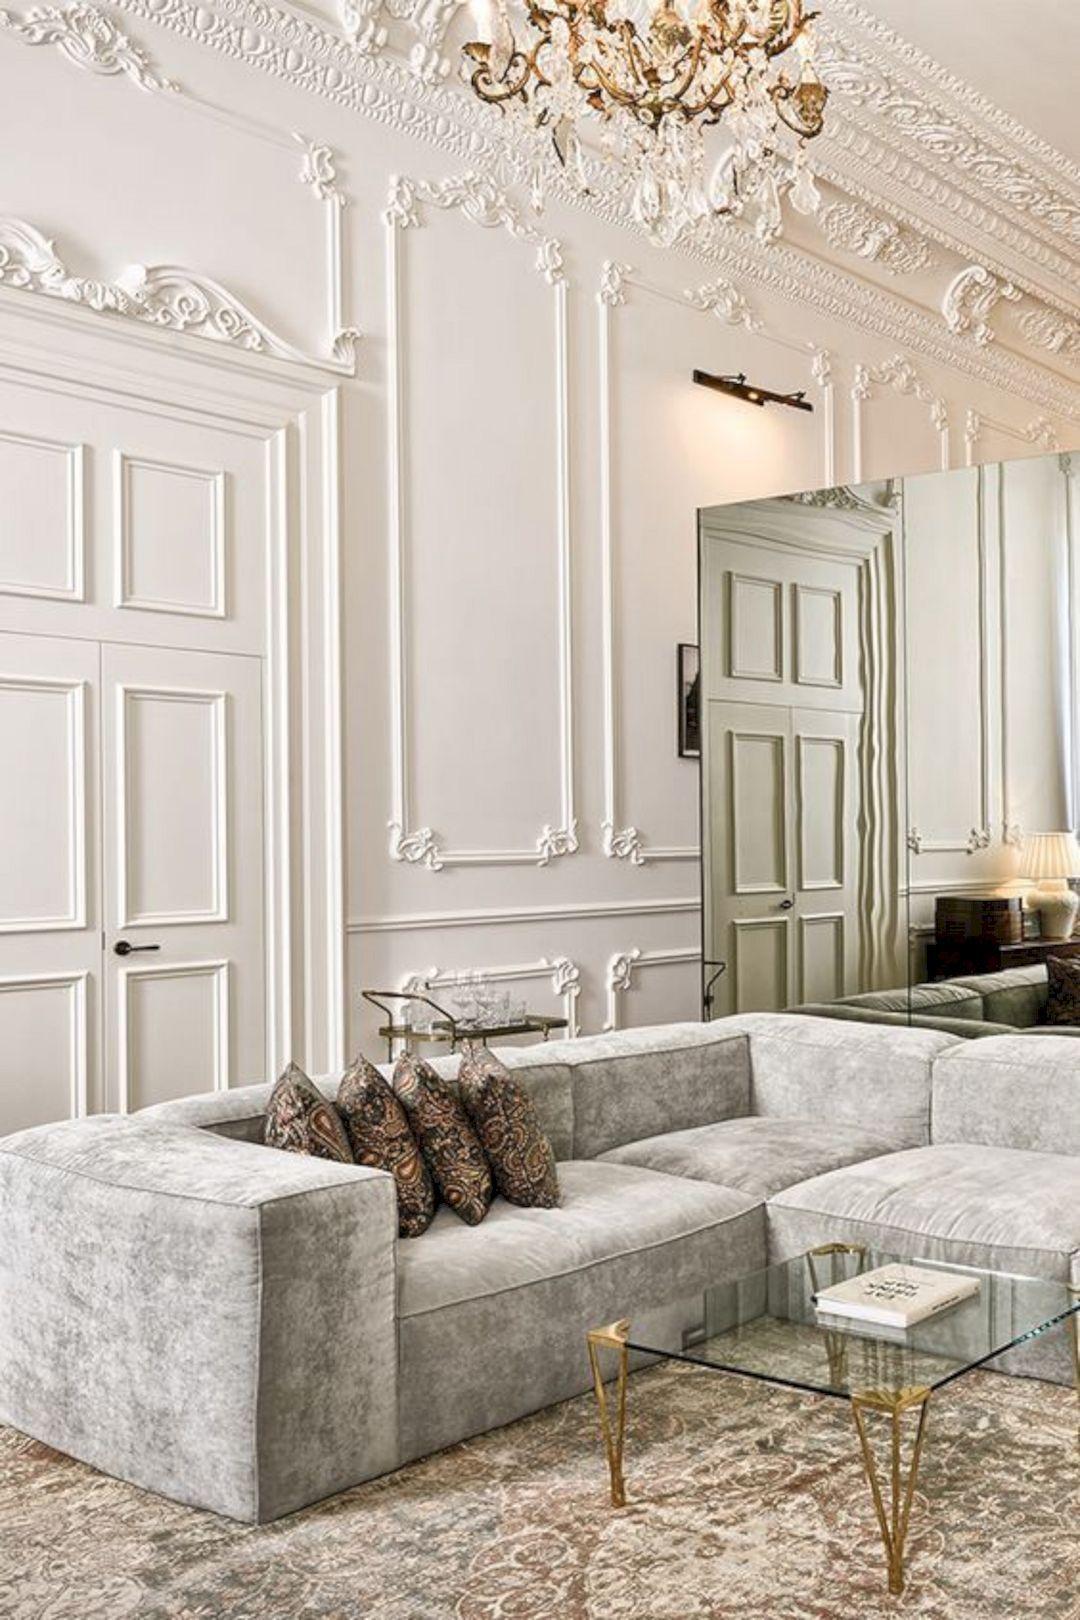 traditional room decoration ideas https futuristarchitecture also purple interior design color schemes wall paint rh pinterest